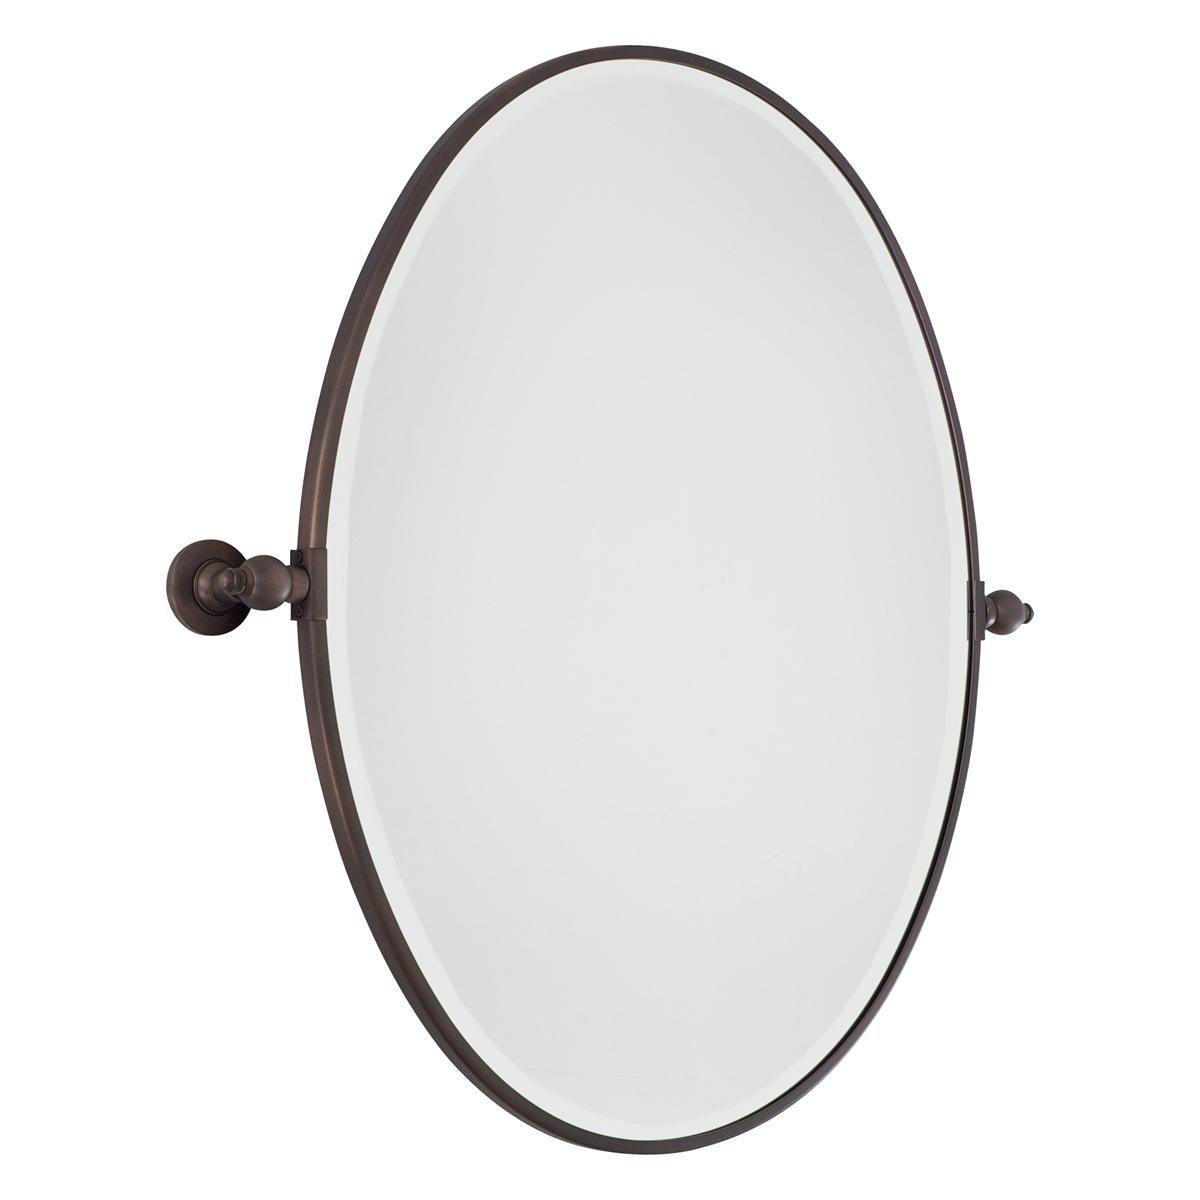 Oiled Bronze Bathroom Mirror: Oval Tilt Bathroom Mirror Large - 3 Finishes